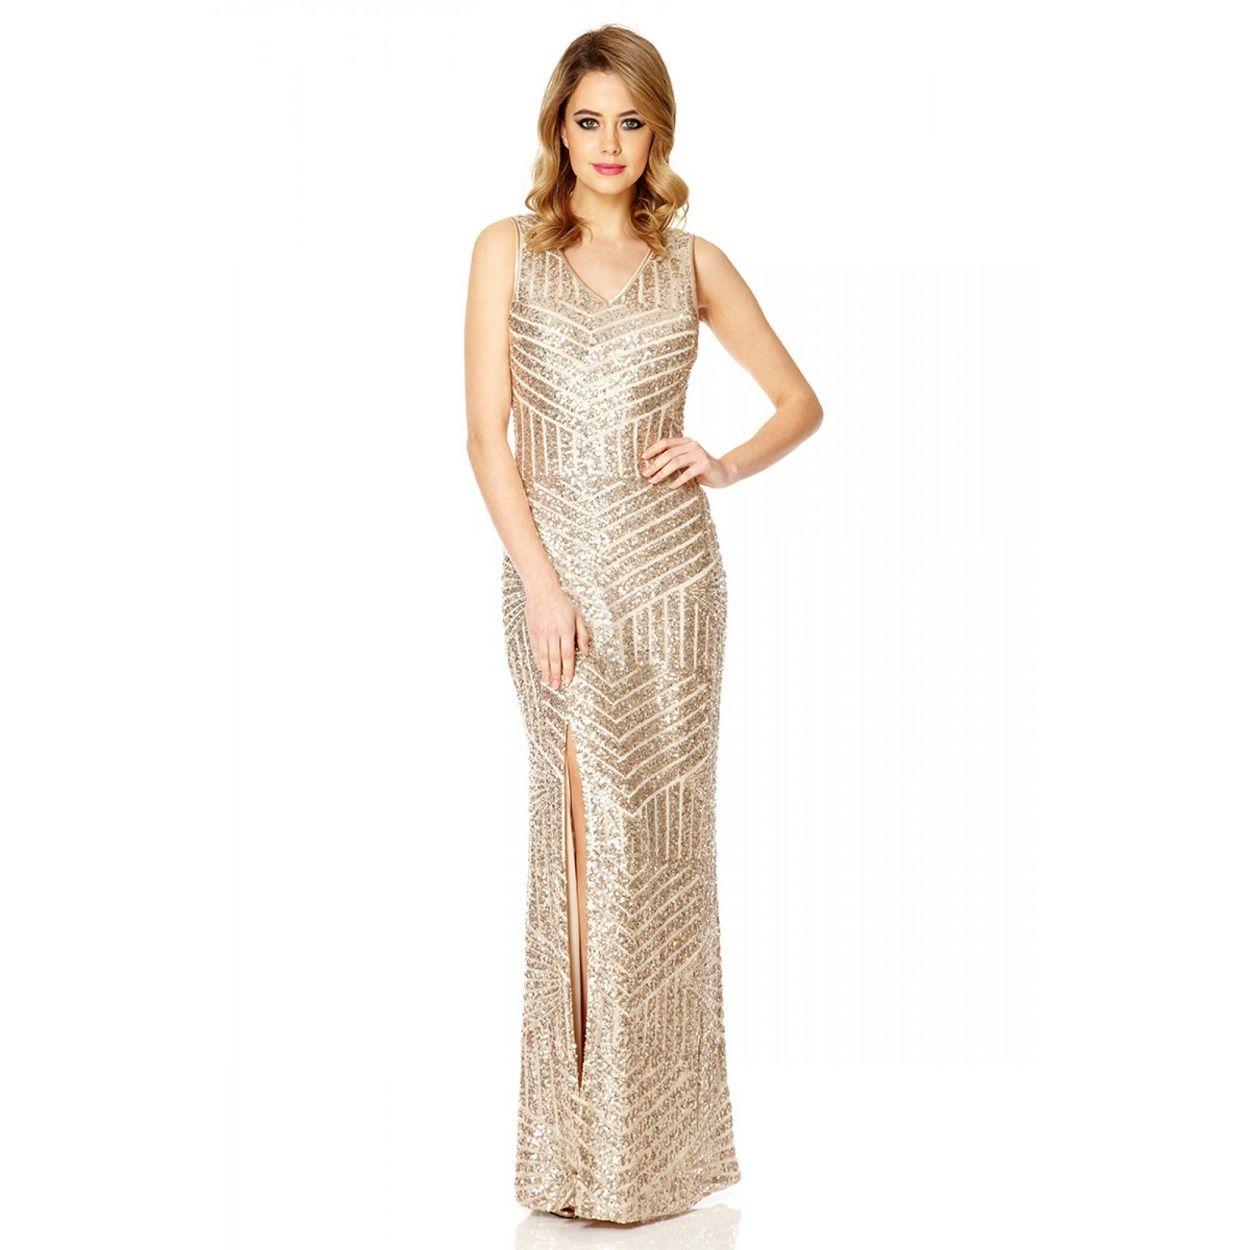 Quiz champagne sequin zig zag split maxi dress at debenhams quiz champagne sequin zig zag split maxi dress at debenhams ombrellifo Gallery